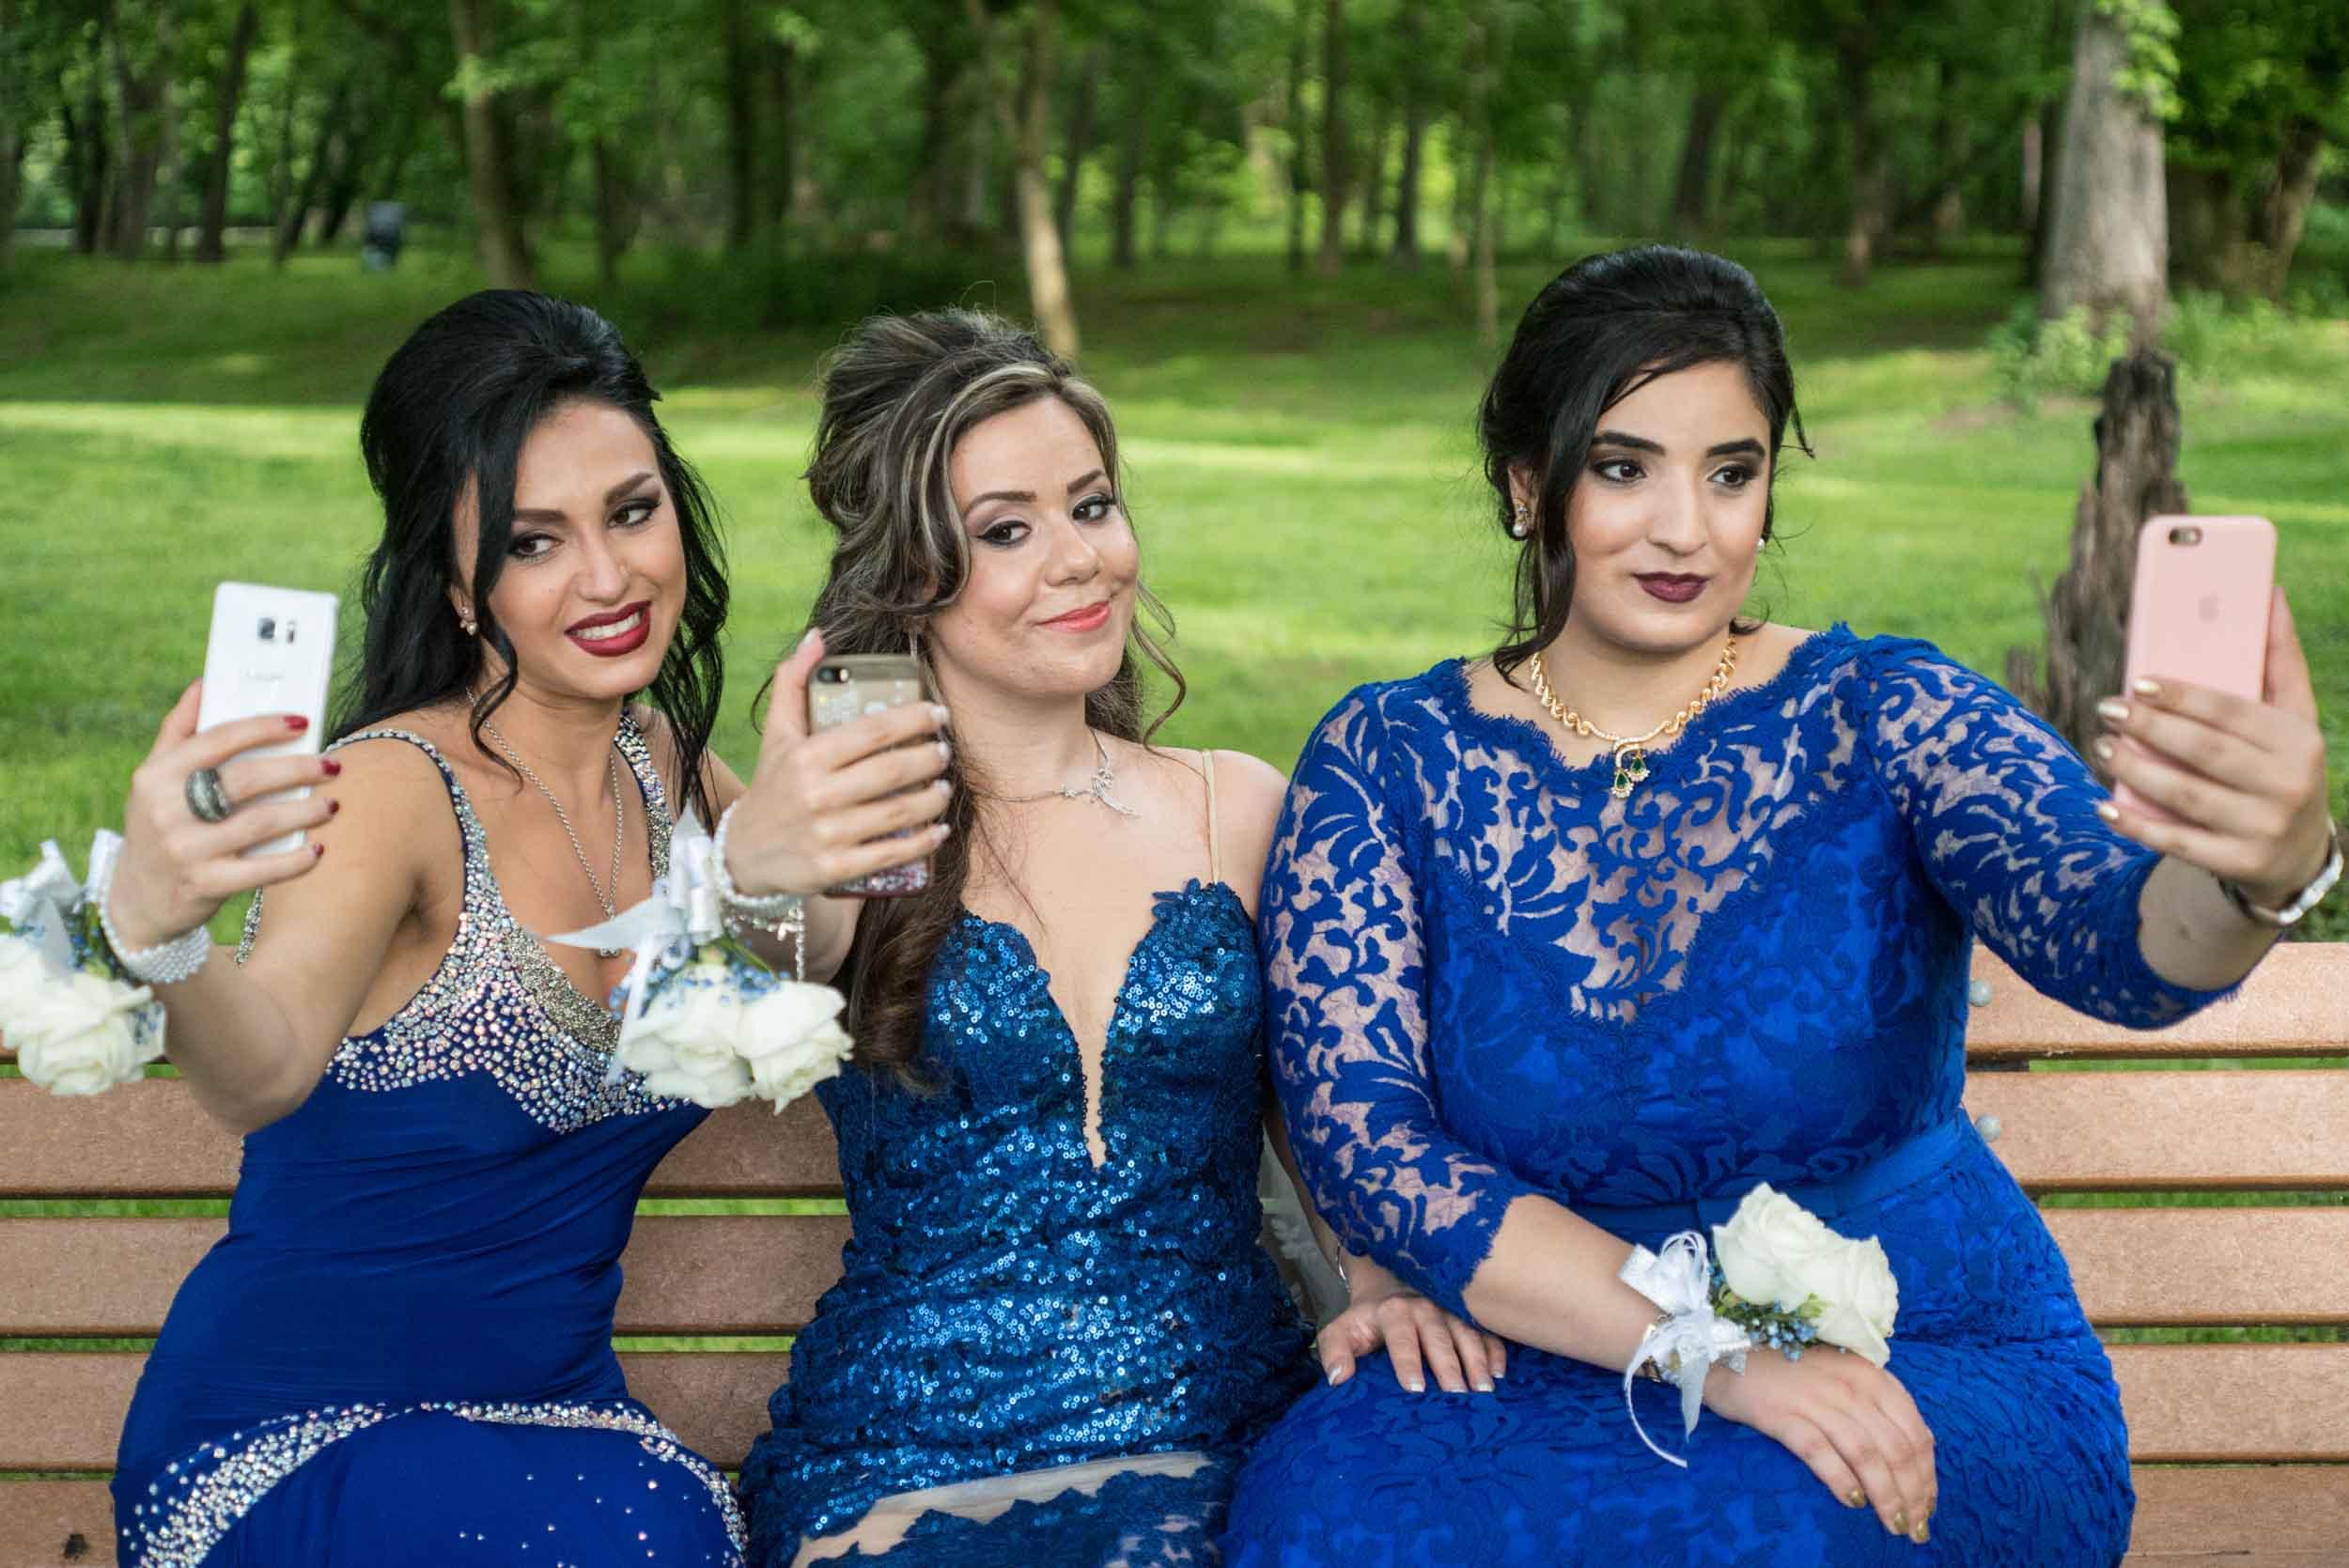 dc+metro+wedding+photographer+vadym+guliuk+photography+weddings+bridesmaids-2020.jpg